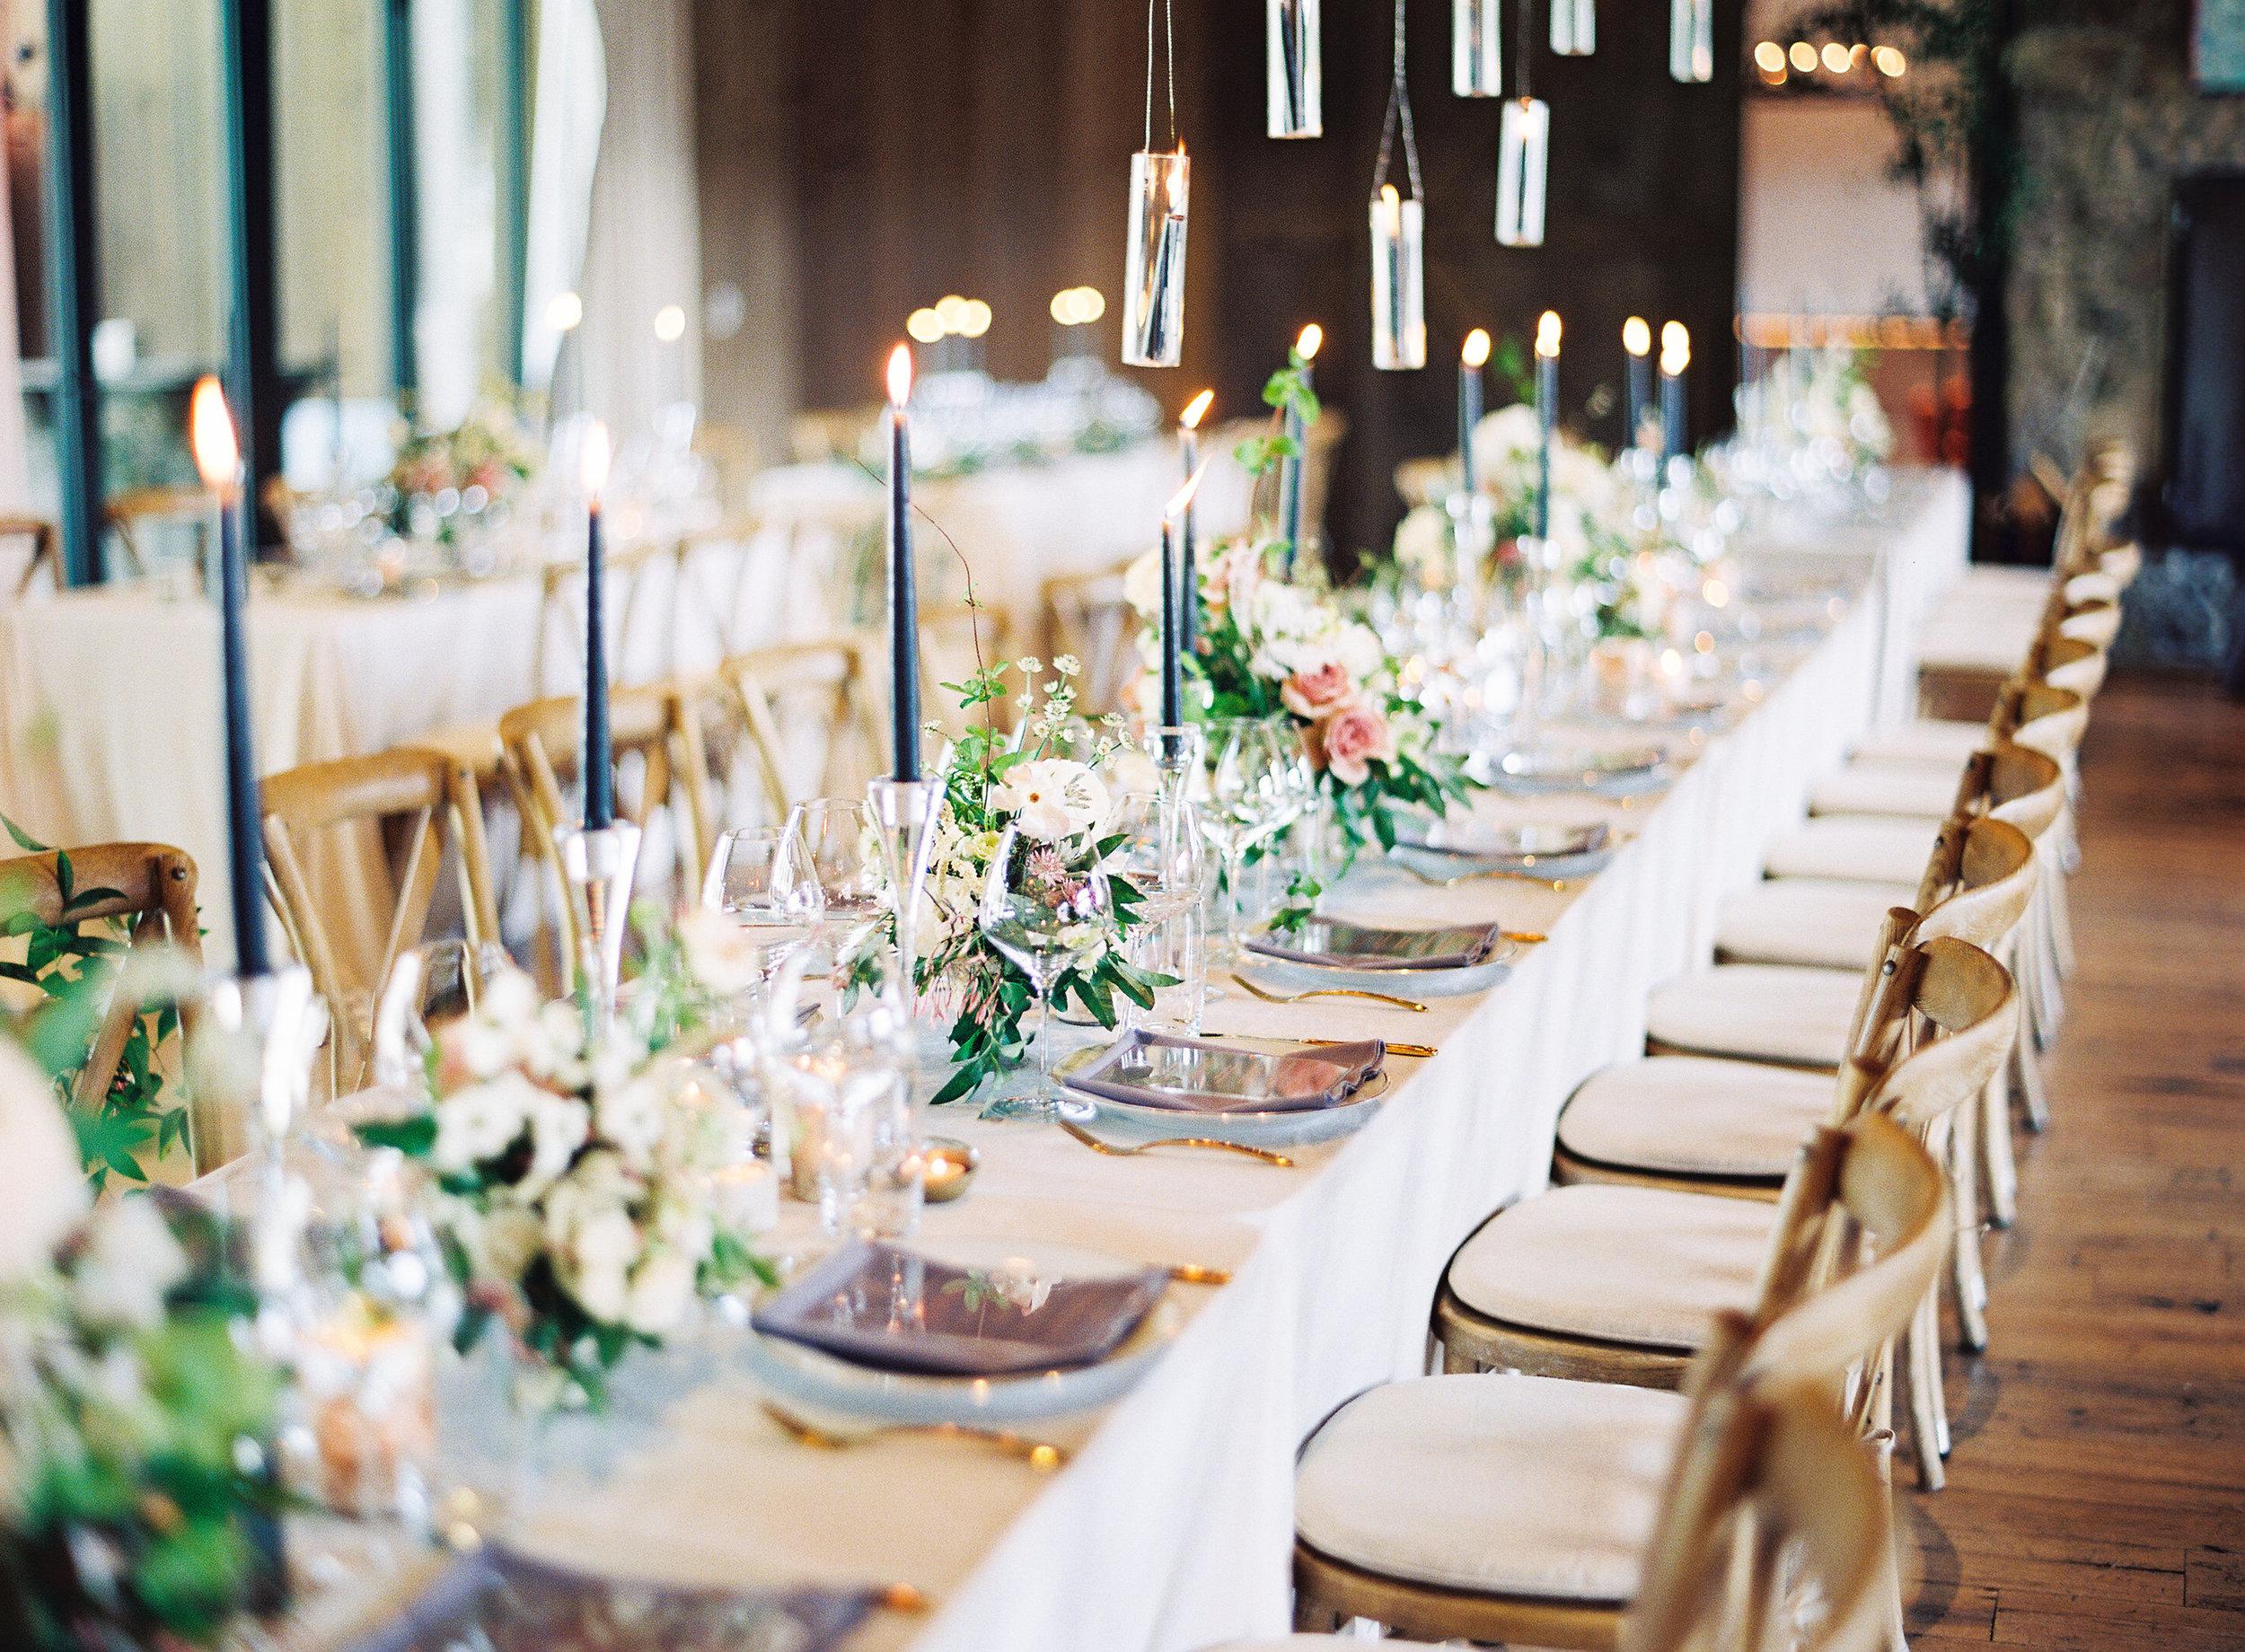 Blackberry Farm Wedding dinner tablescape